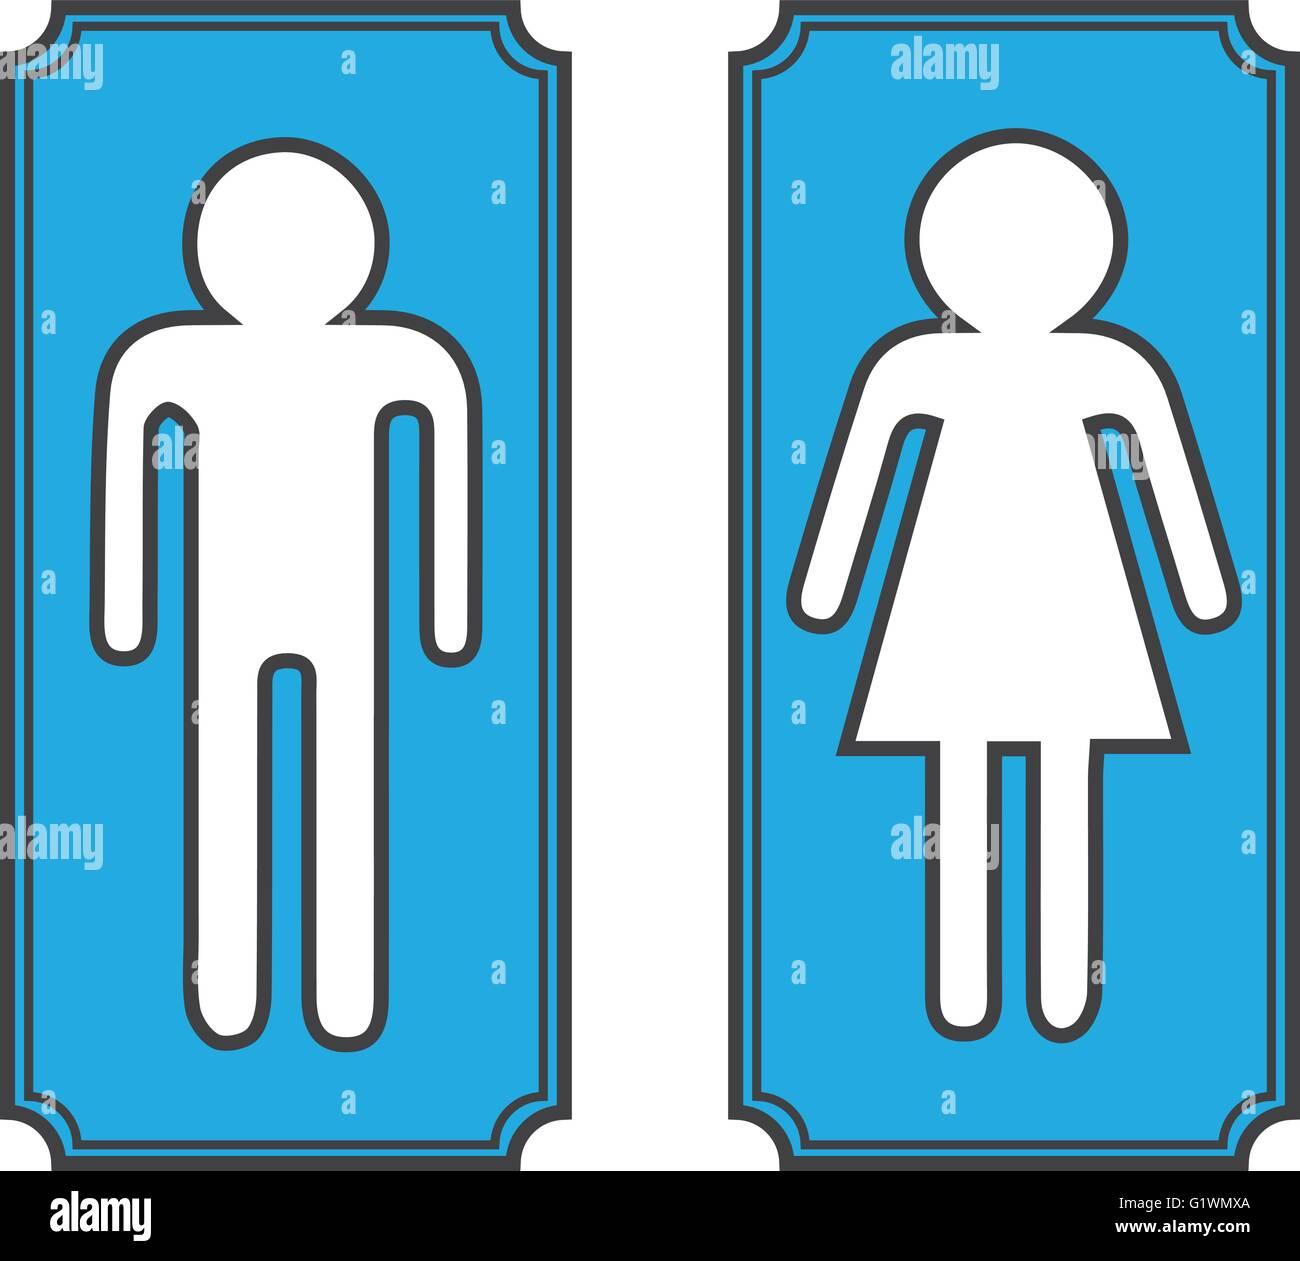 . Restroom banners  toilet signs Stock Vector Art   Illustration